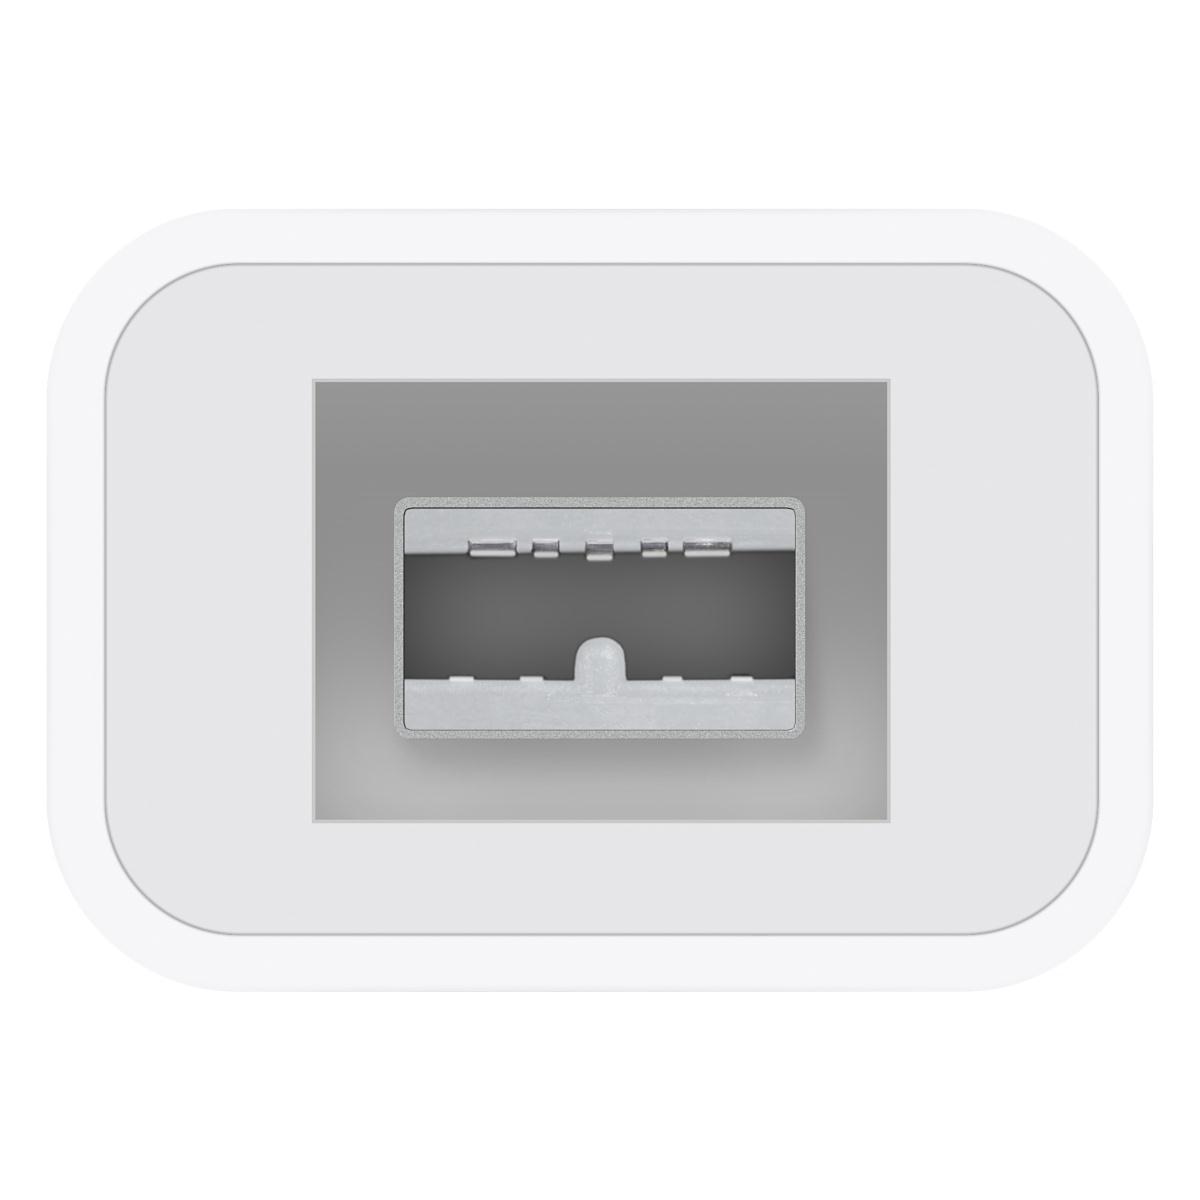 Apple Thunderbolt to FireWire Adaptor (White)